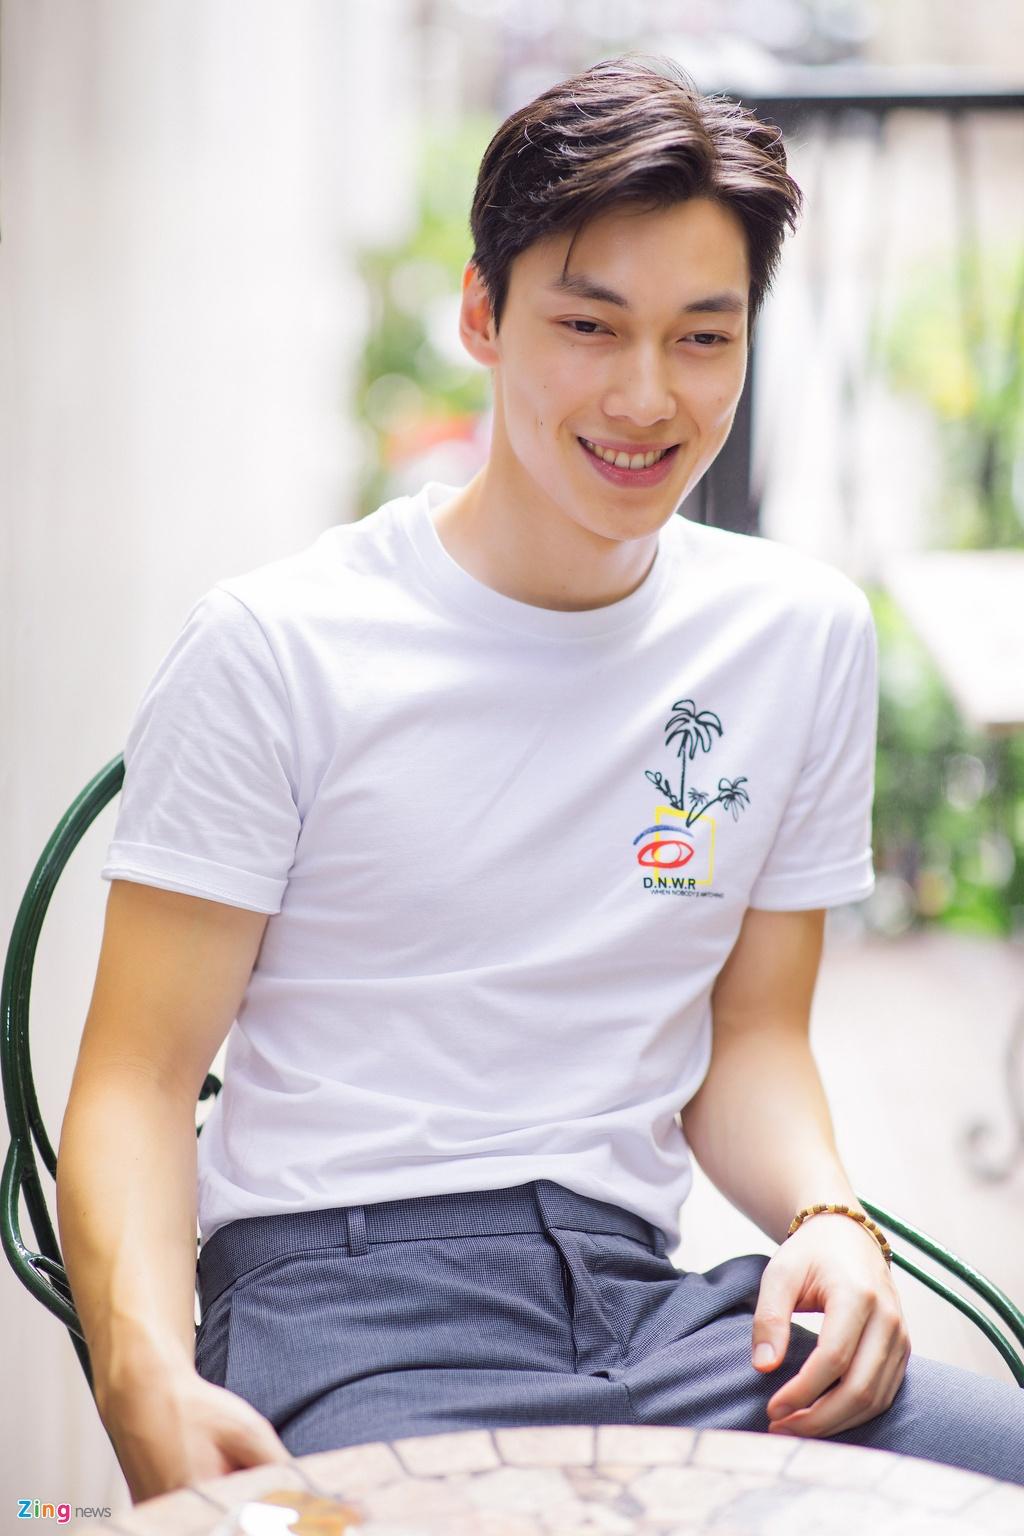 Em trai Viet kieu cua Thu Ngoc: 'Toi duoc chu y sau Nguoi ay la ai' hinh anh 9 NGT_5746_zing.jpg